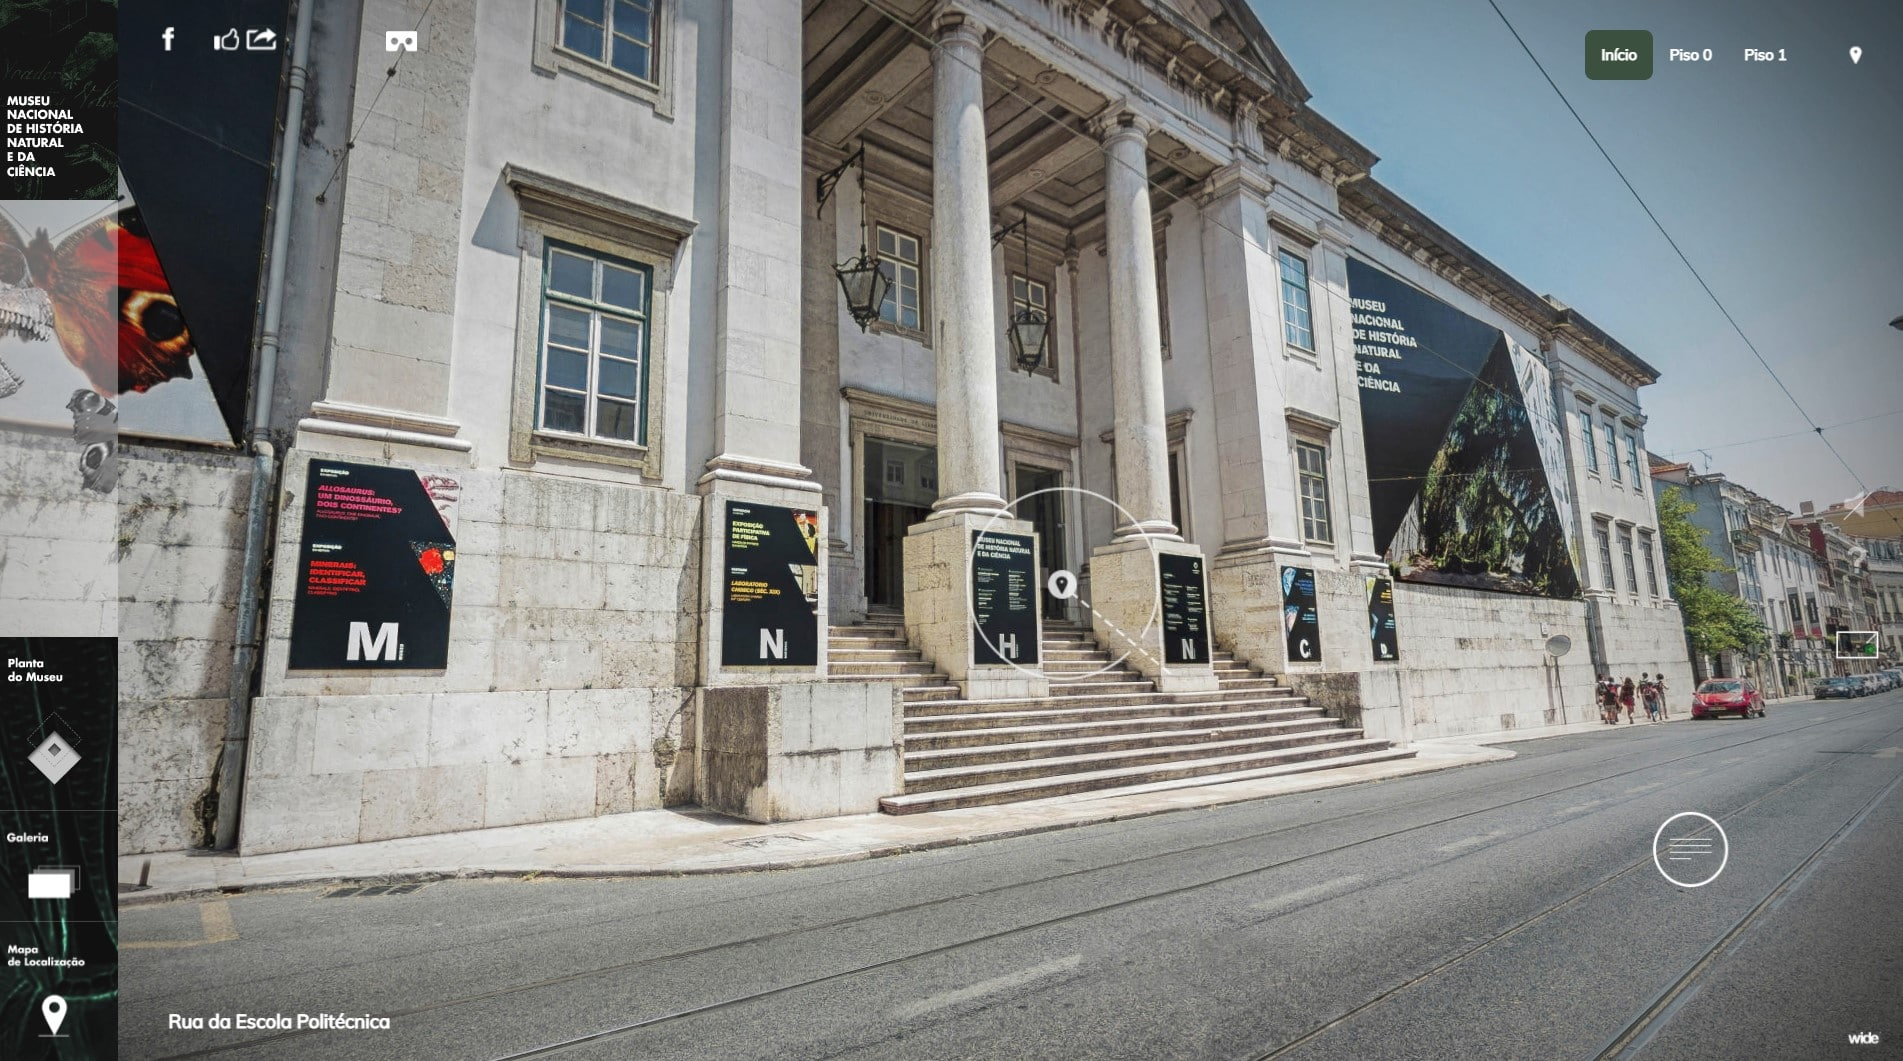 museus nacionais - visita virtual museu história natural